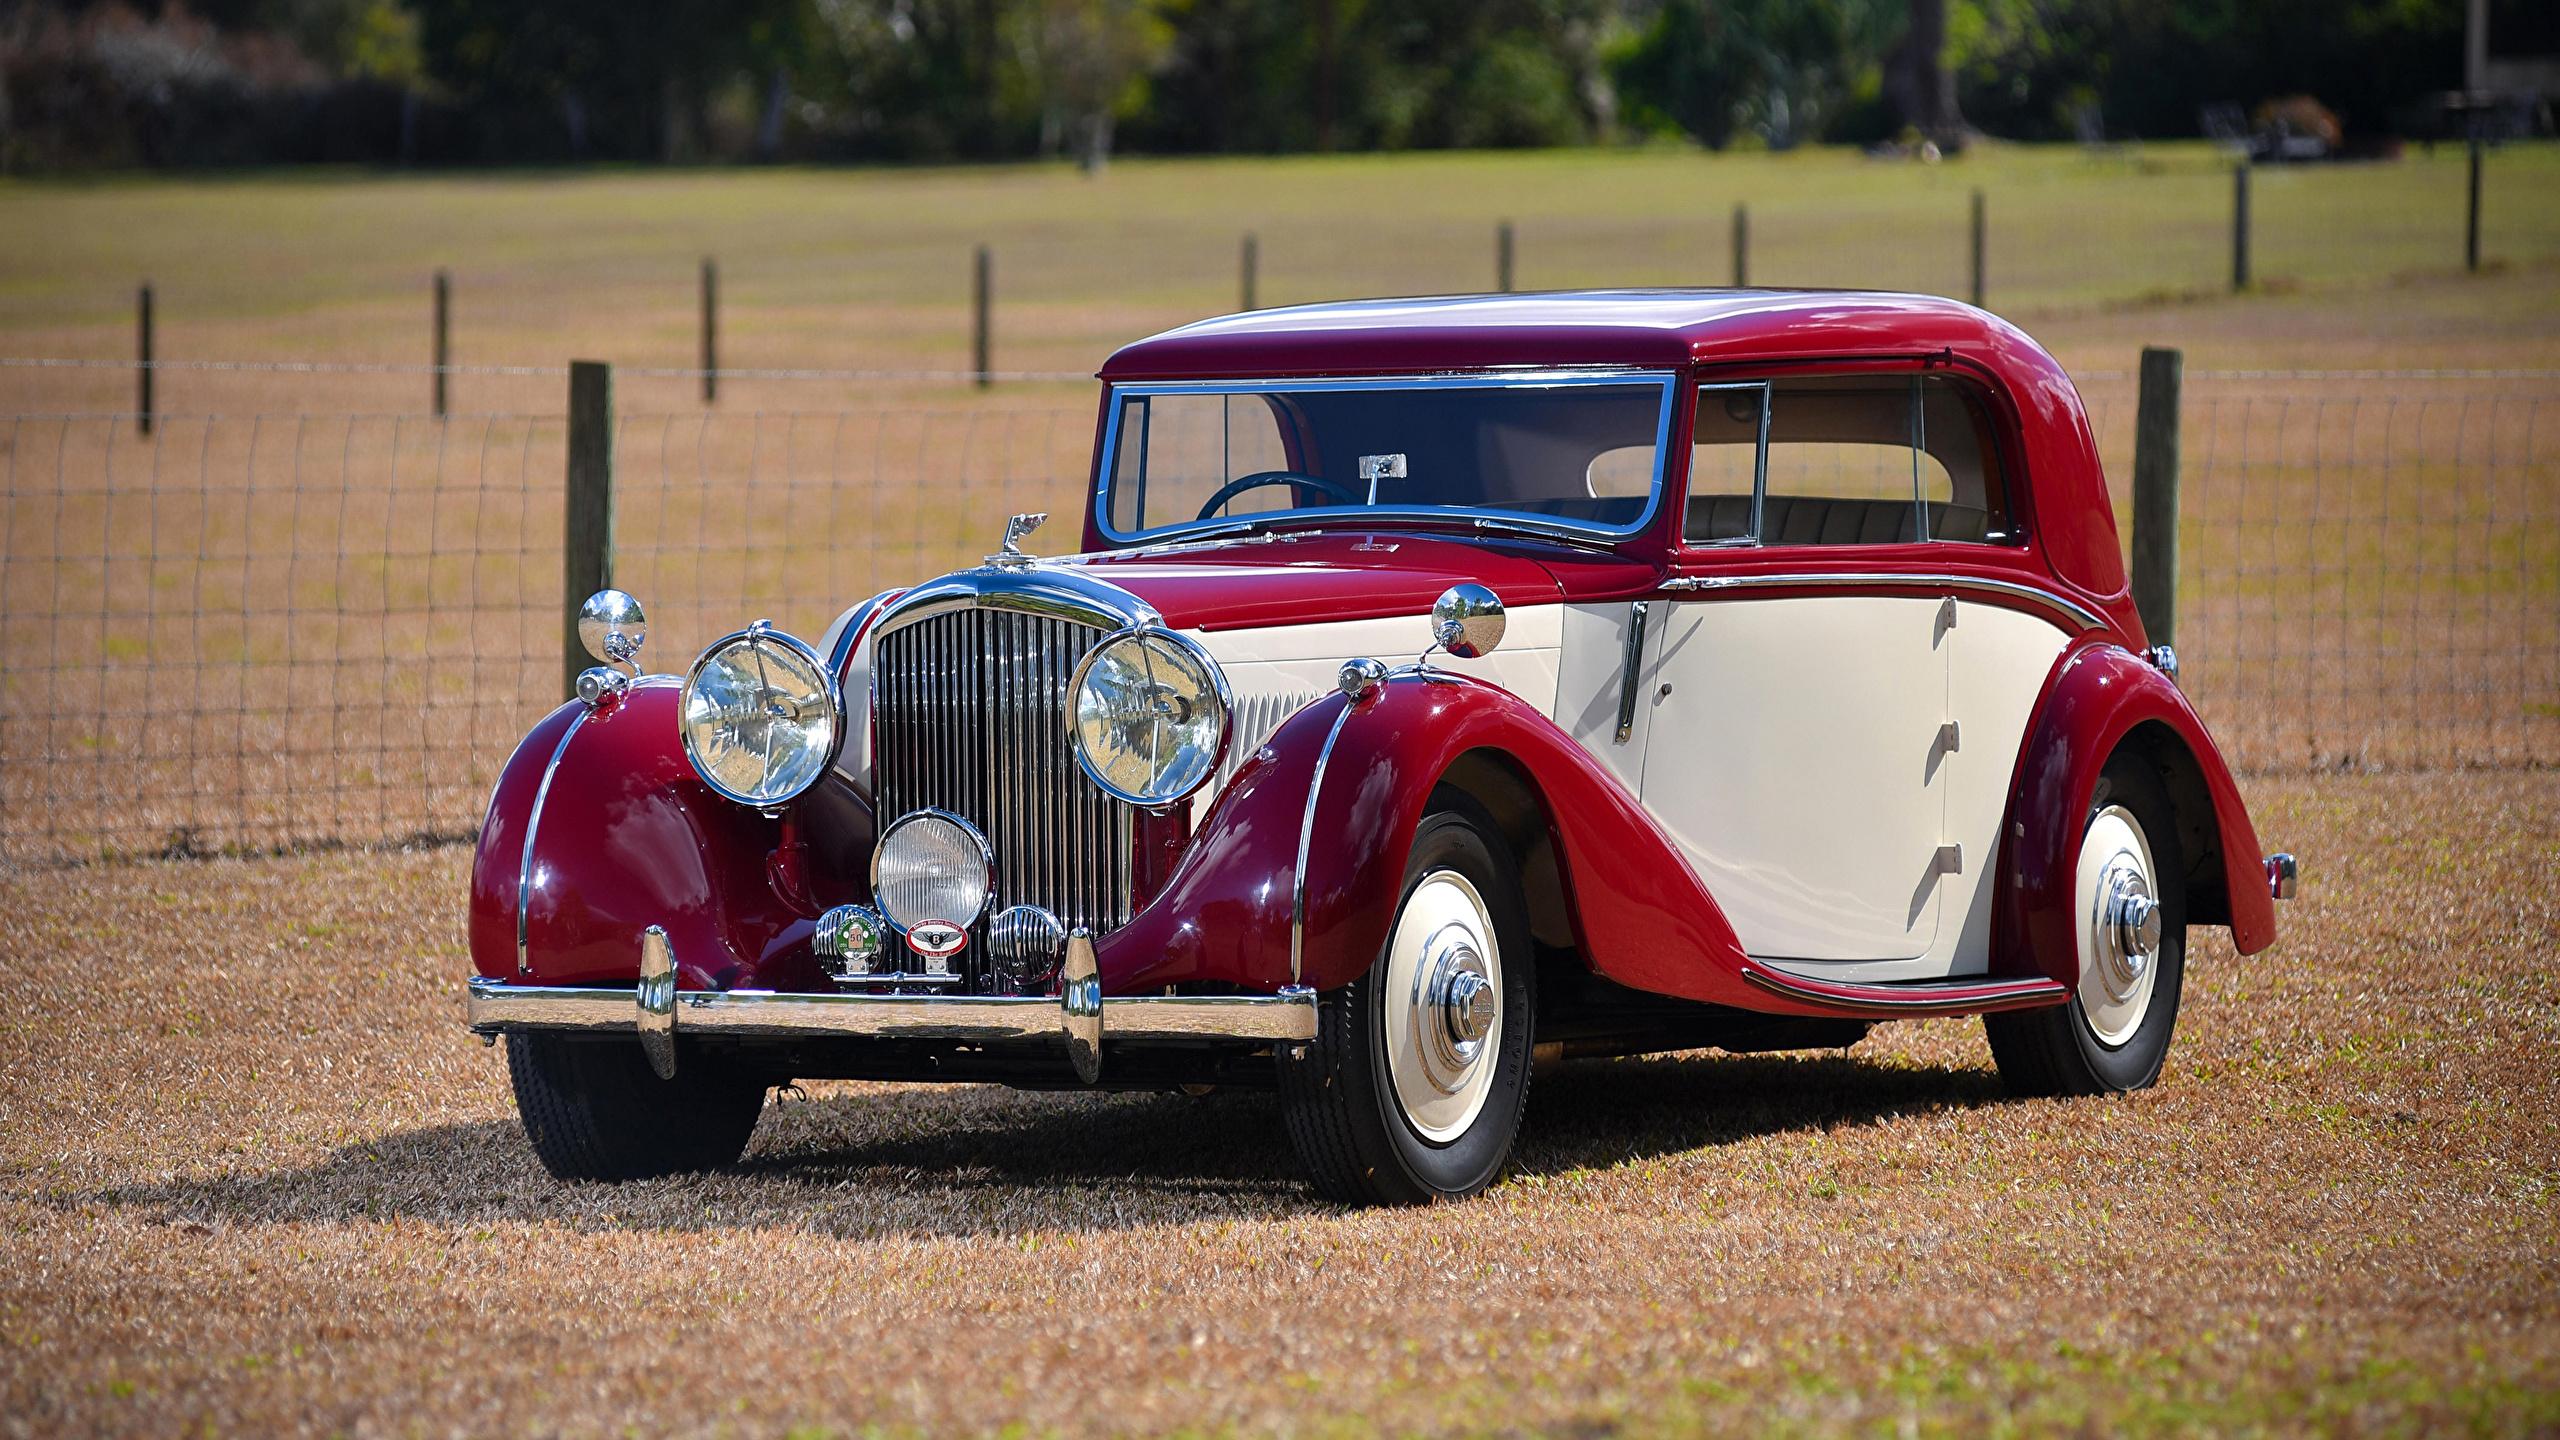 Картинка Бентли 1939 4 ¼ Litre Coupe by Park Ward винтаж Металлик Автомобили 2560x1440 Bentley Ретро старинные авто машины машина автомобиль